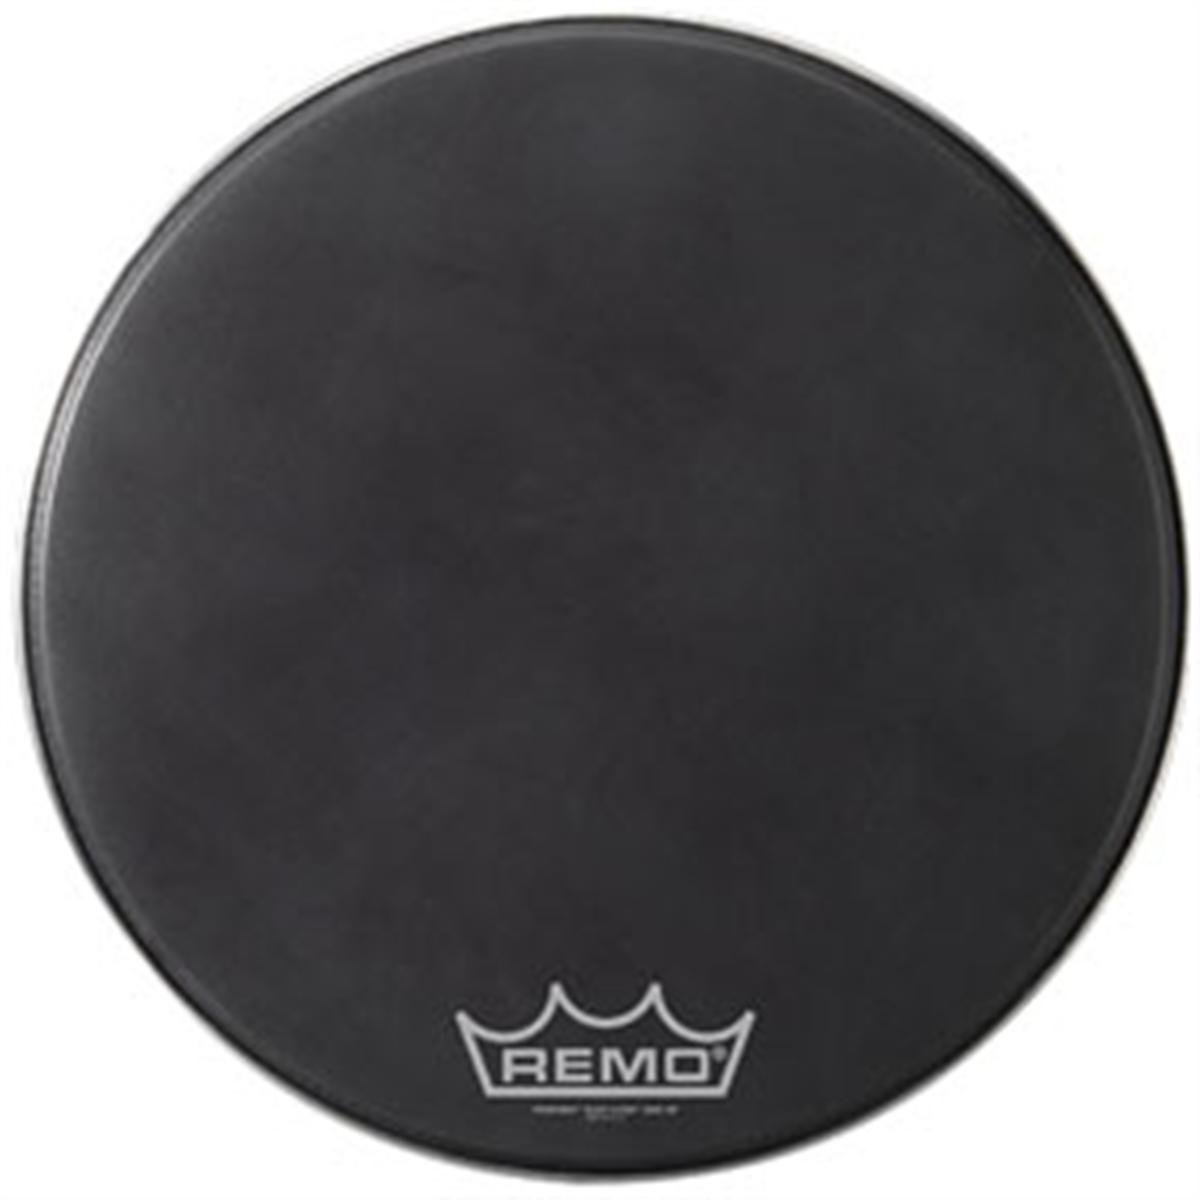 Remo Drum Set, 24-inch (PM1824MP) by Remo